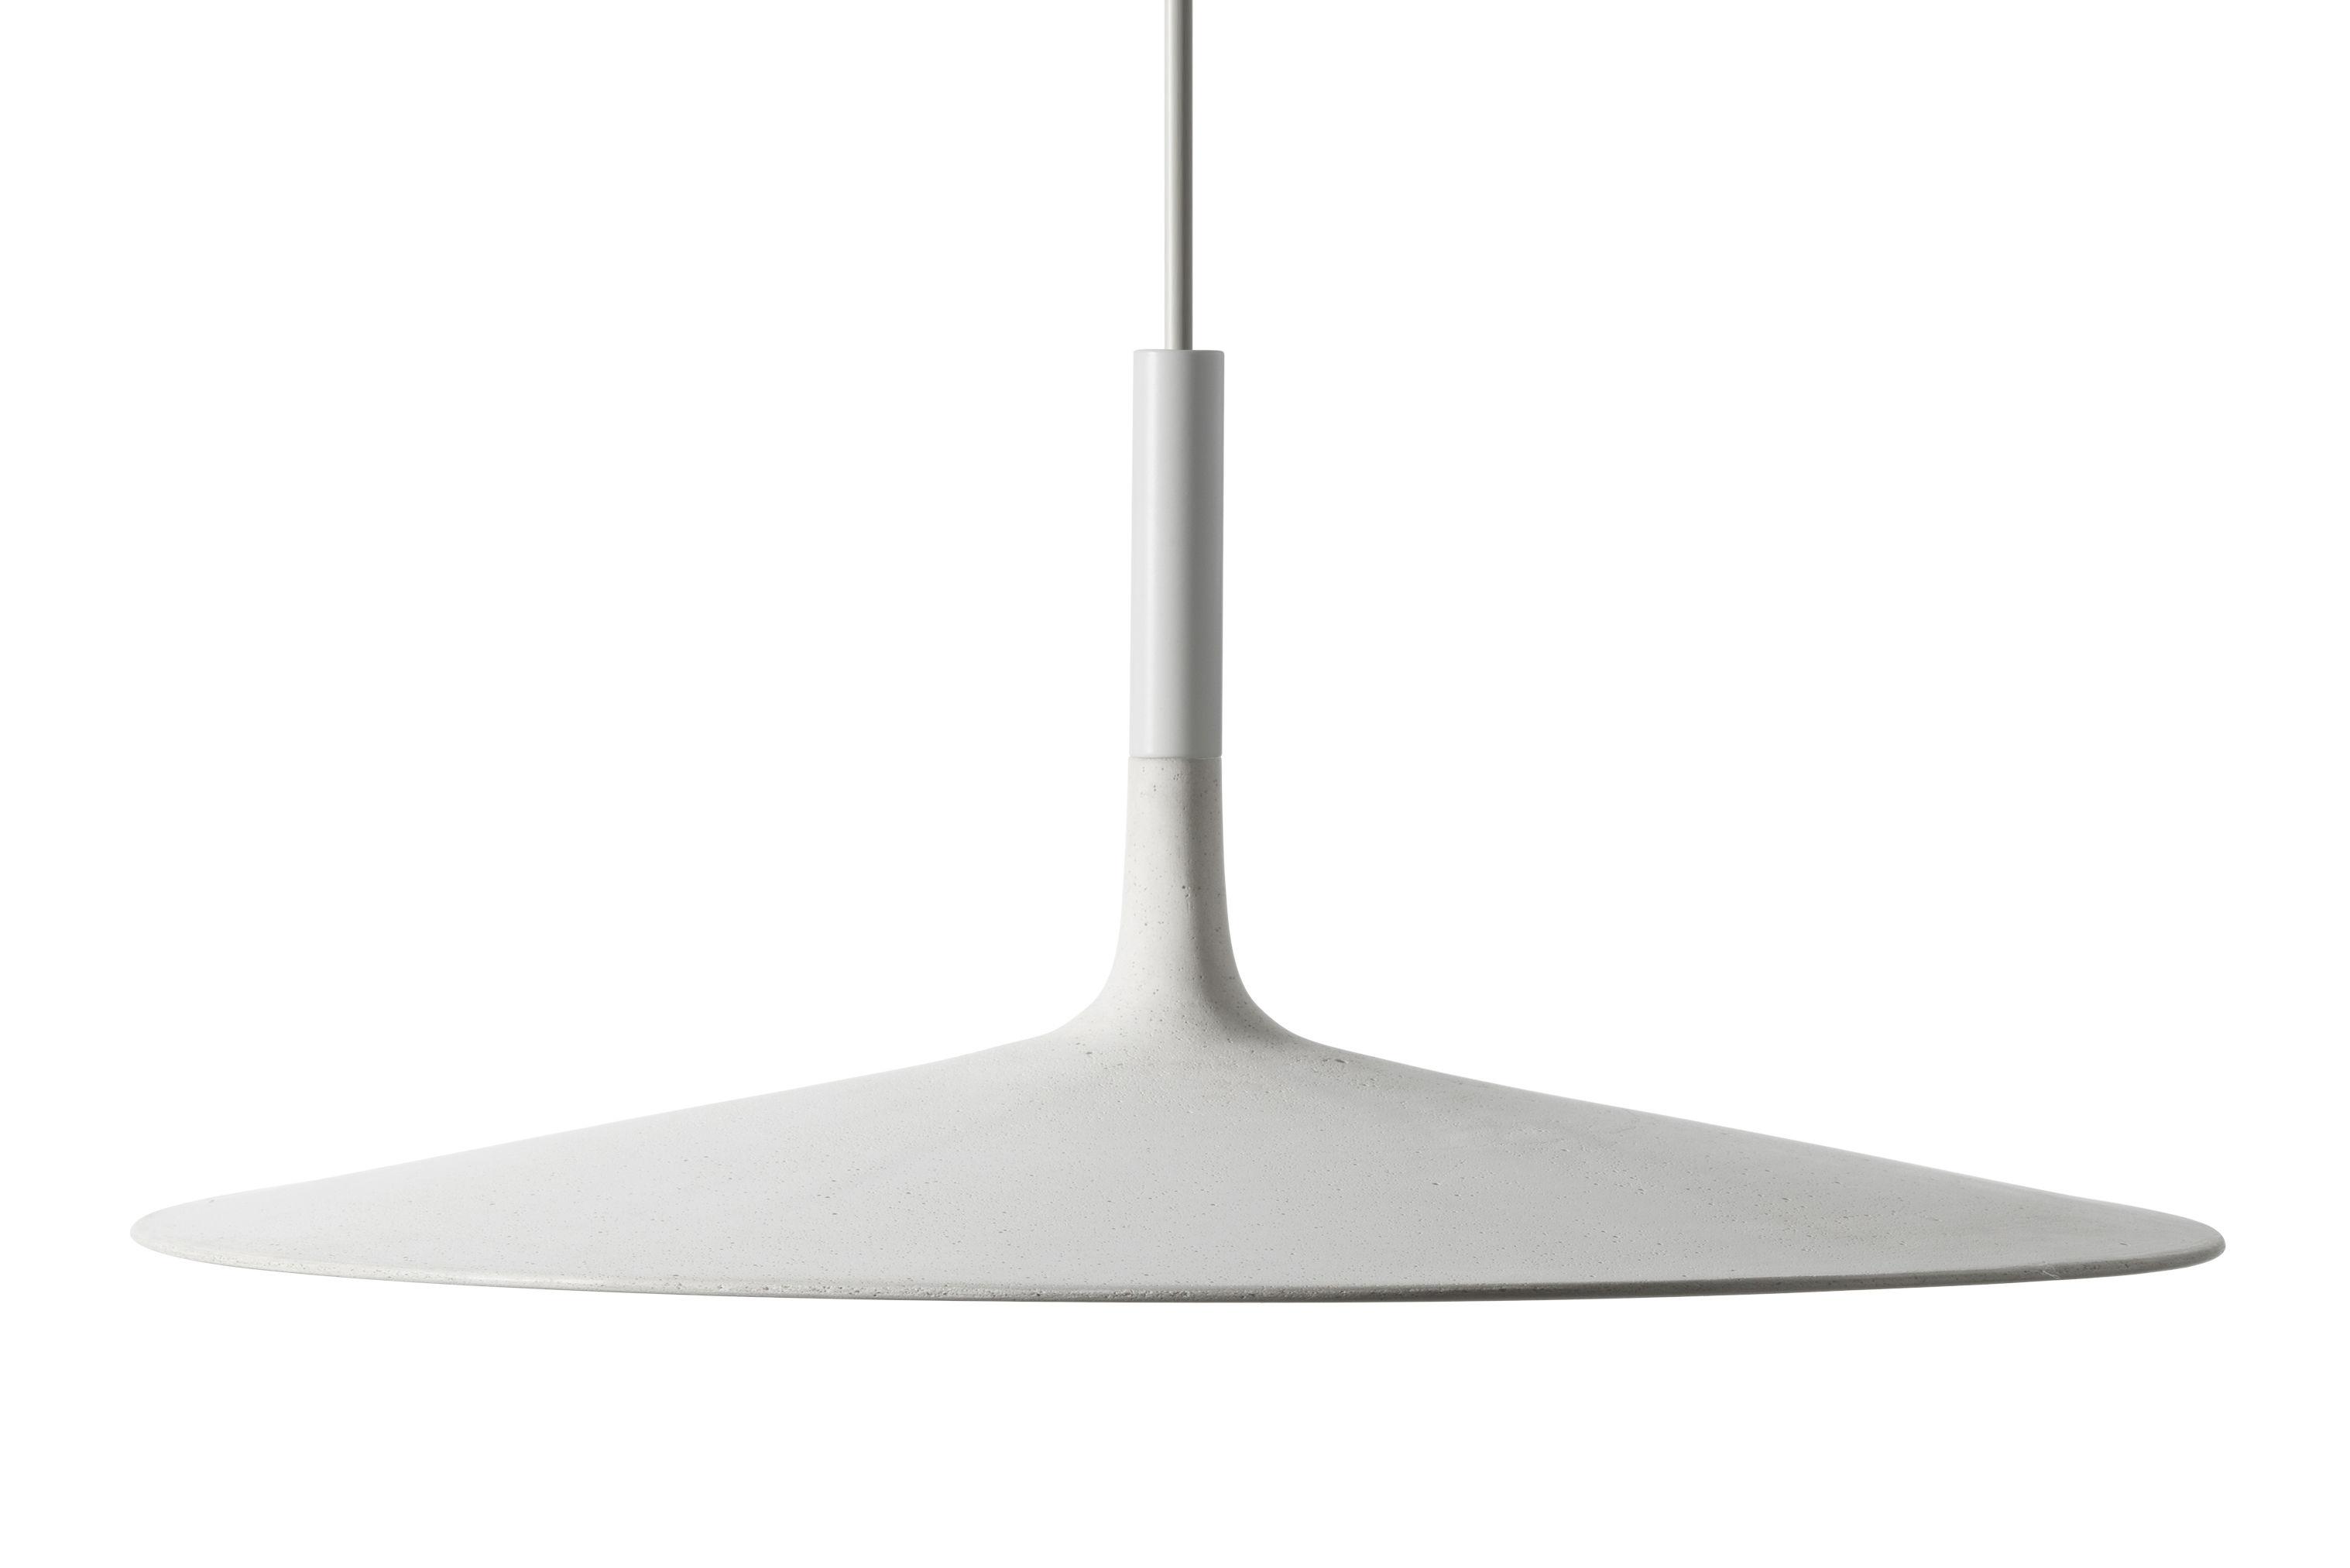 Lighting - Pendant Lighting - Aplomb Large Pendant - LED Cement / Ø 45 x H 20 cm by Foscarini - White - concrete, Lacquered polycarbonate